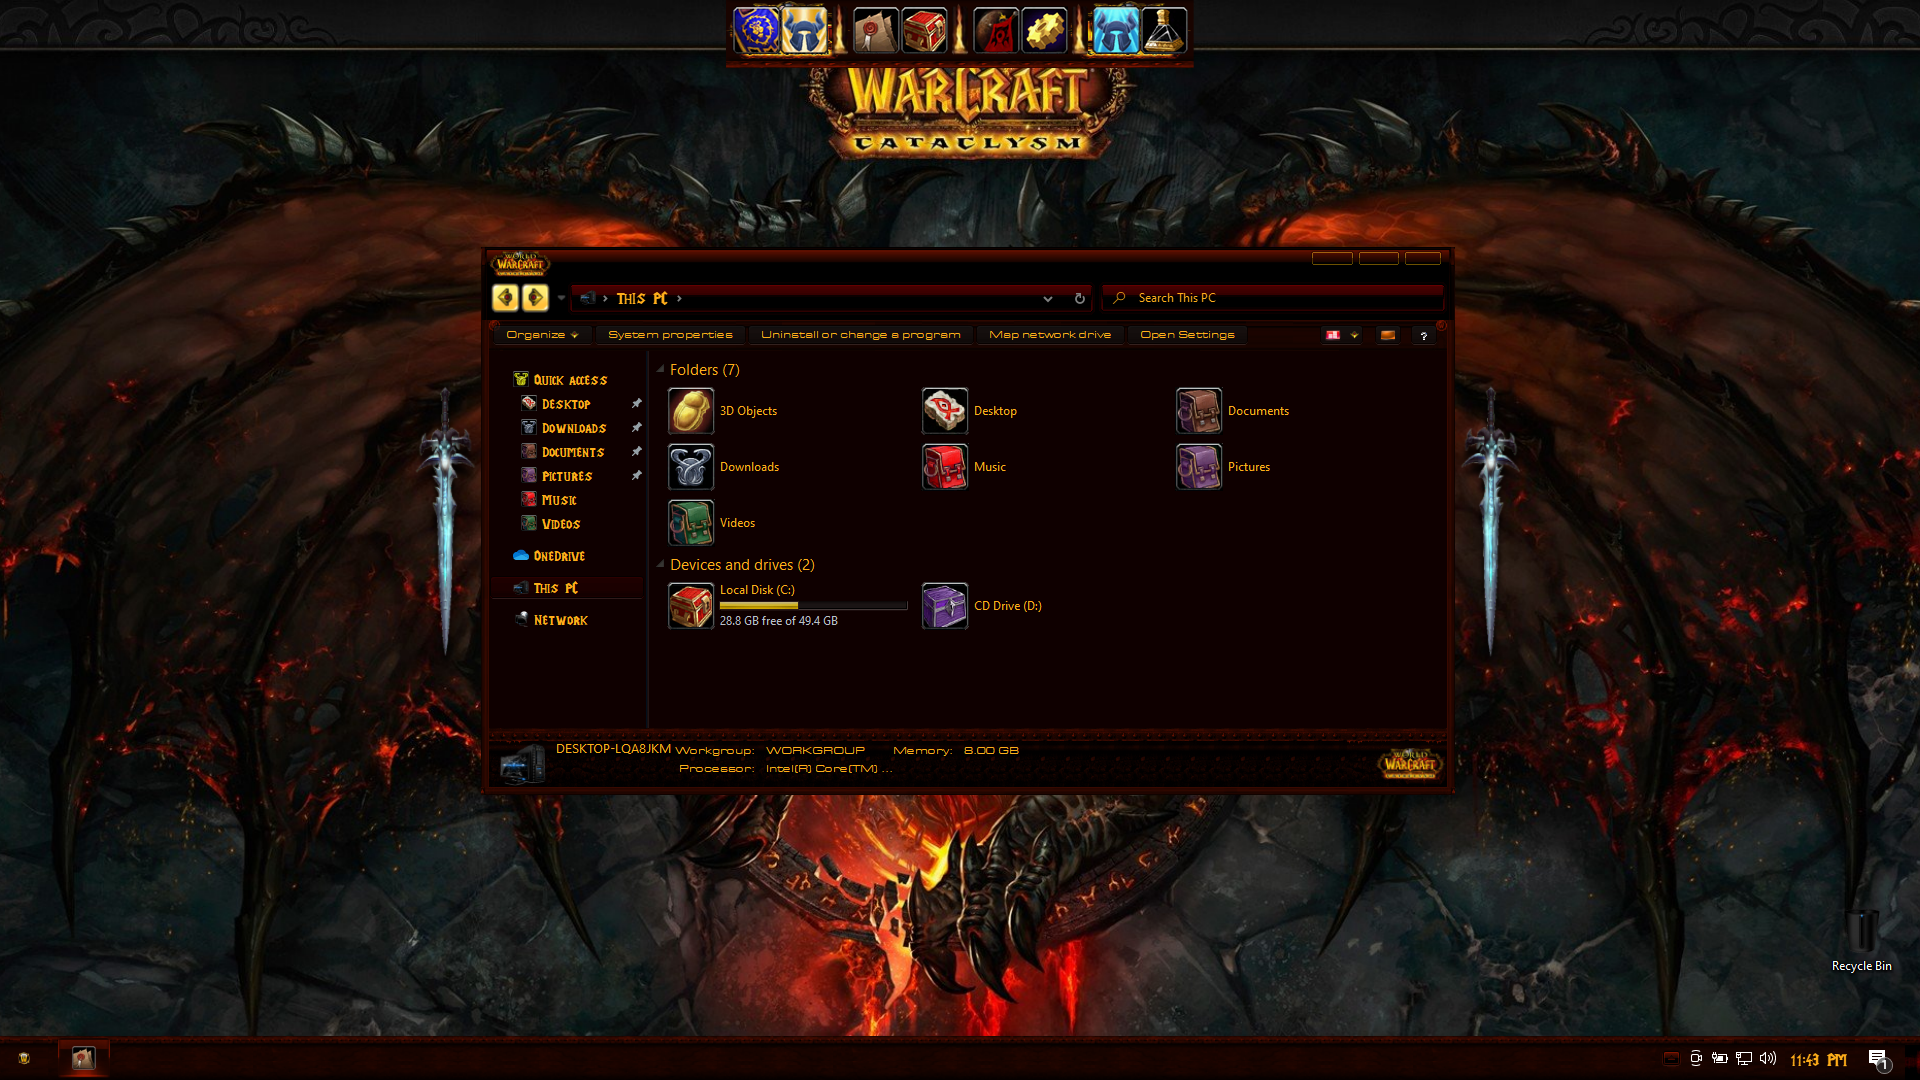 World of Warcraft Cataclysm Premium SkinPack for Windows 10